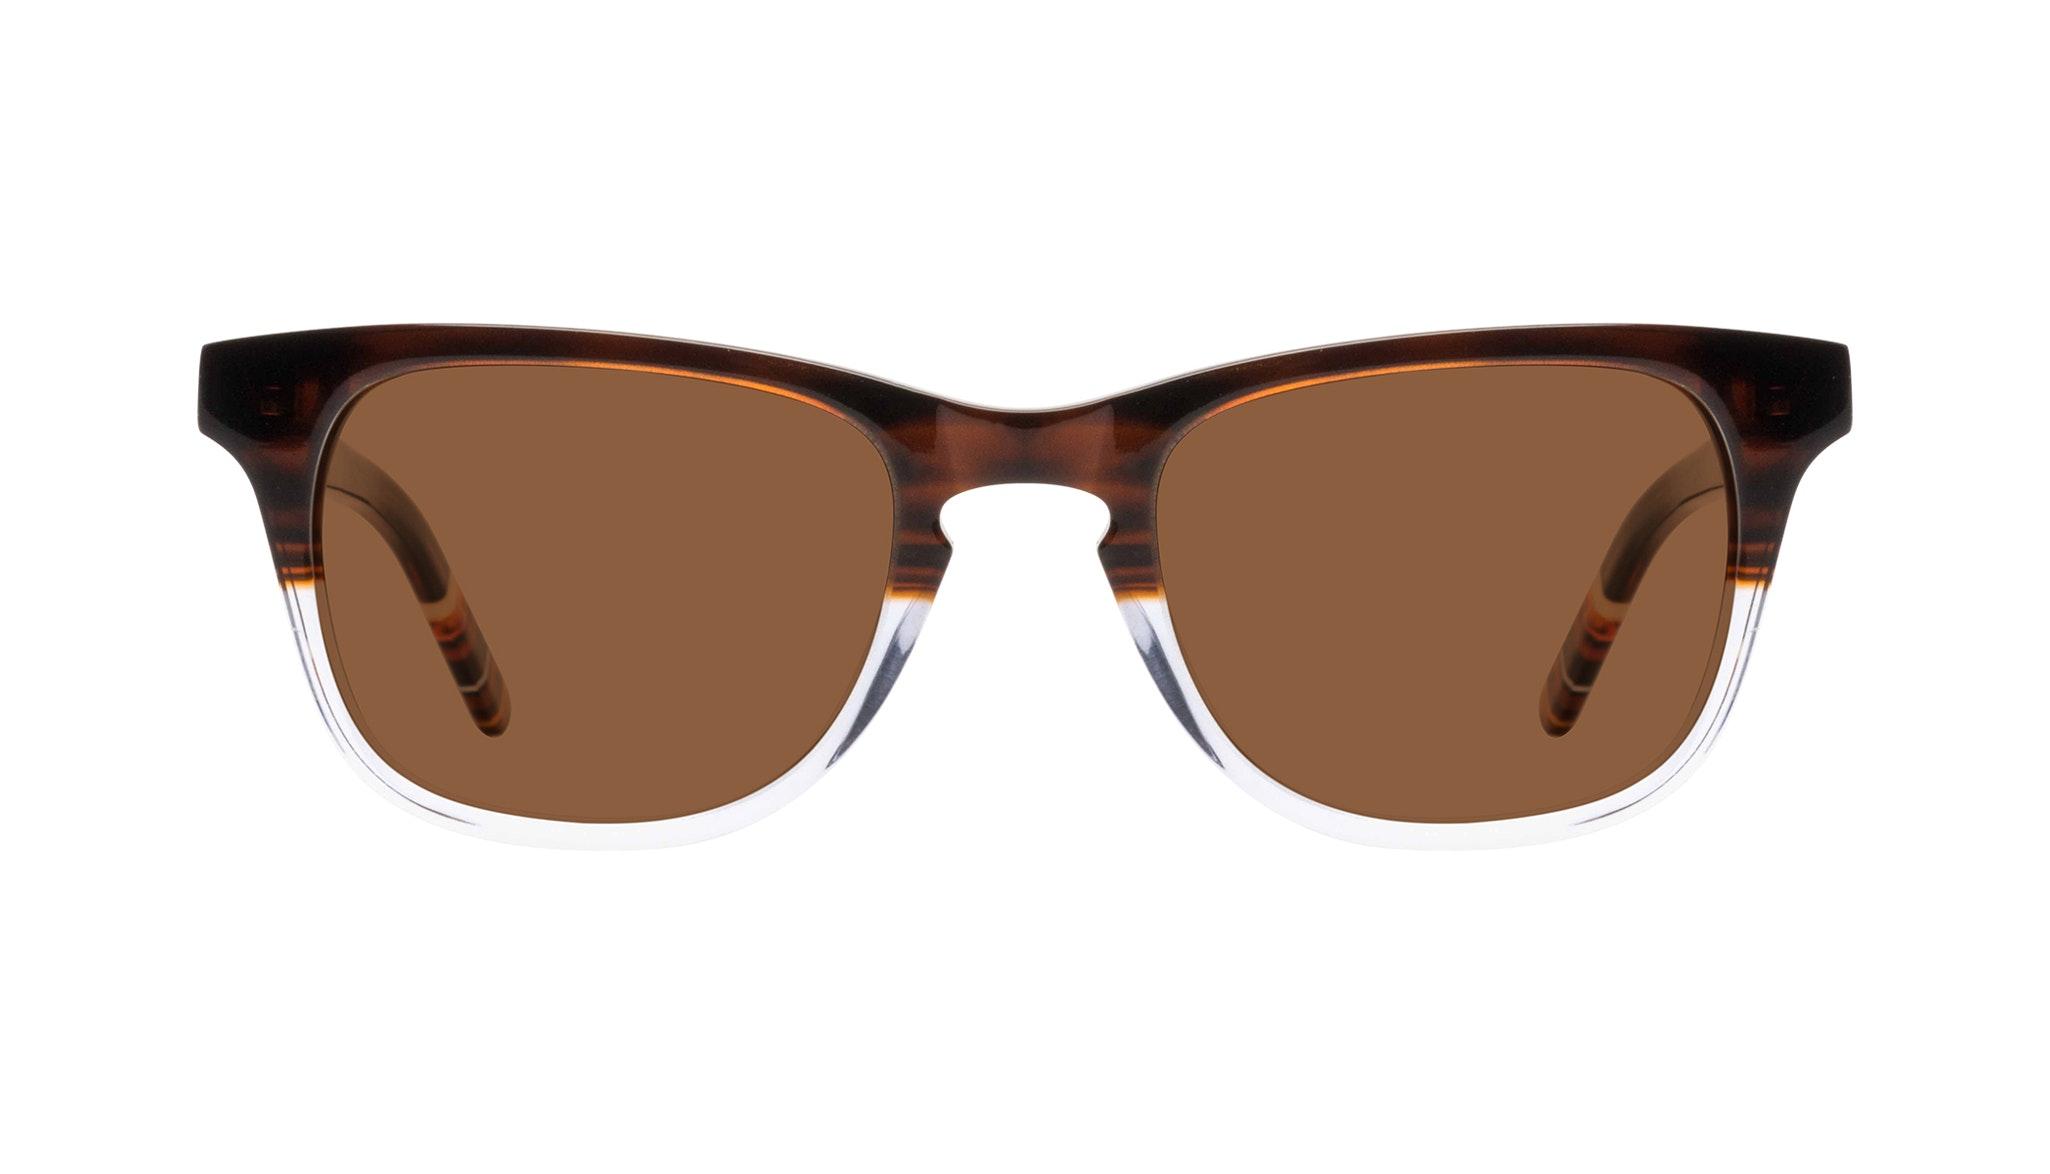 Affordable Fashion Glasses Rectangle Sunglasses Men Trust Bark Front